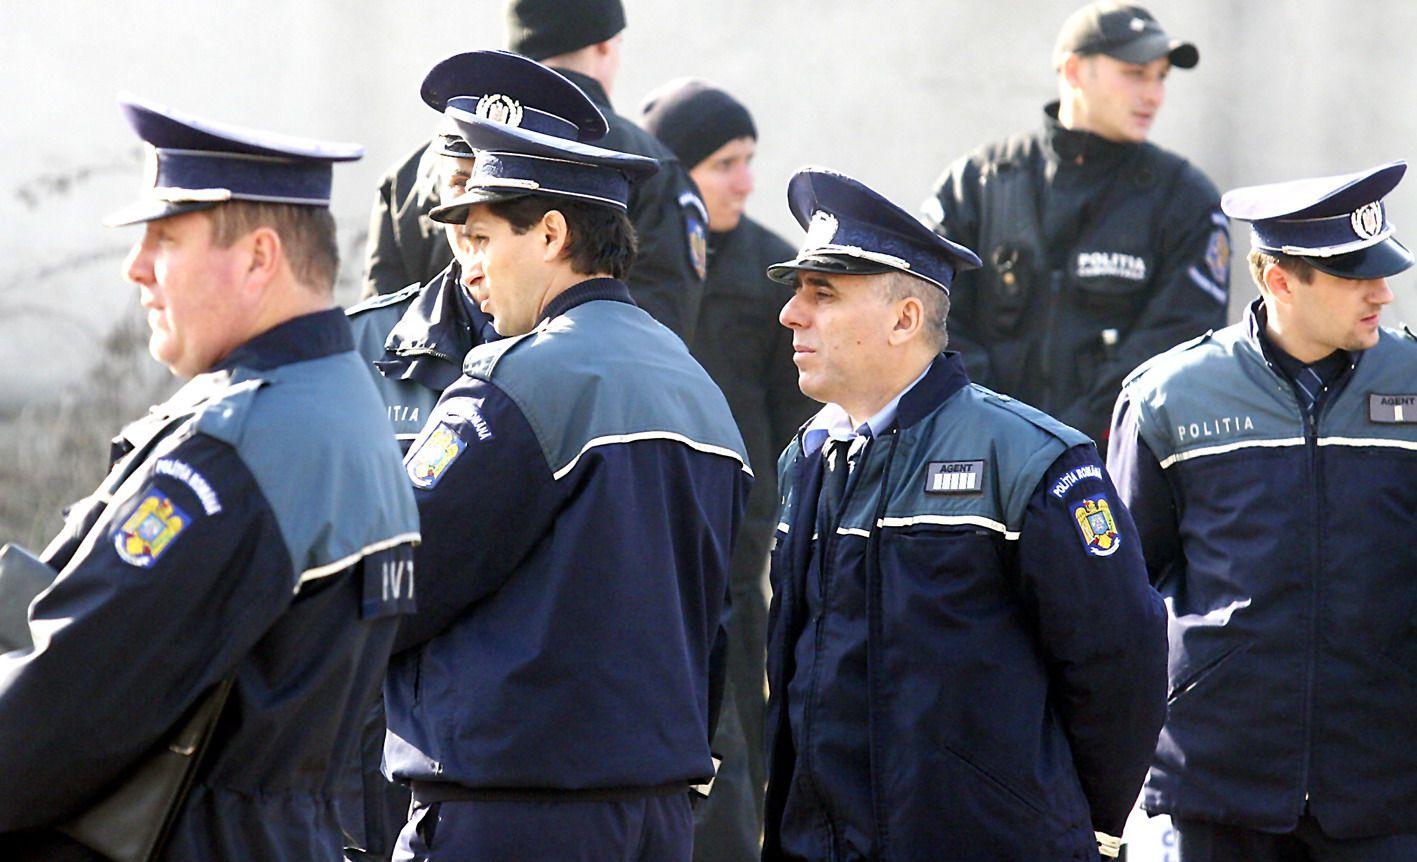 politie21